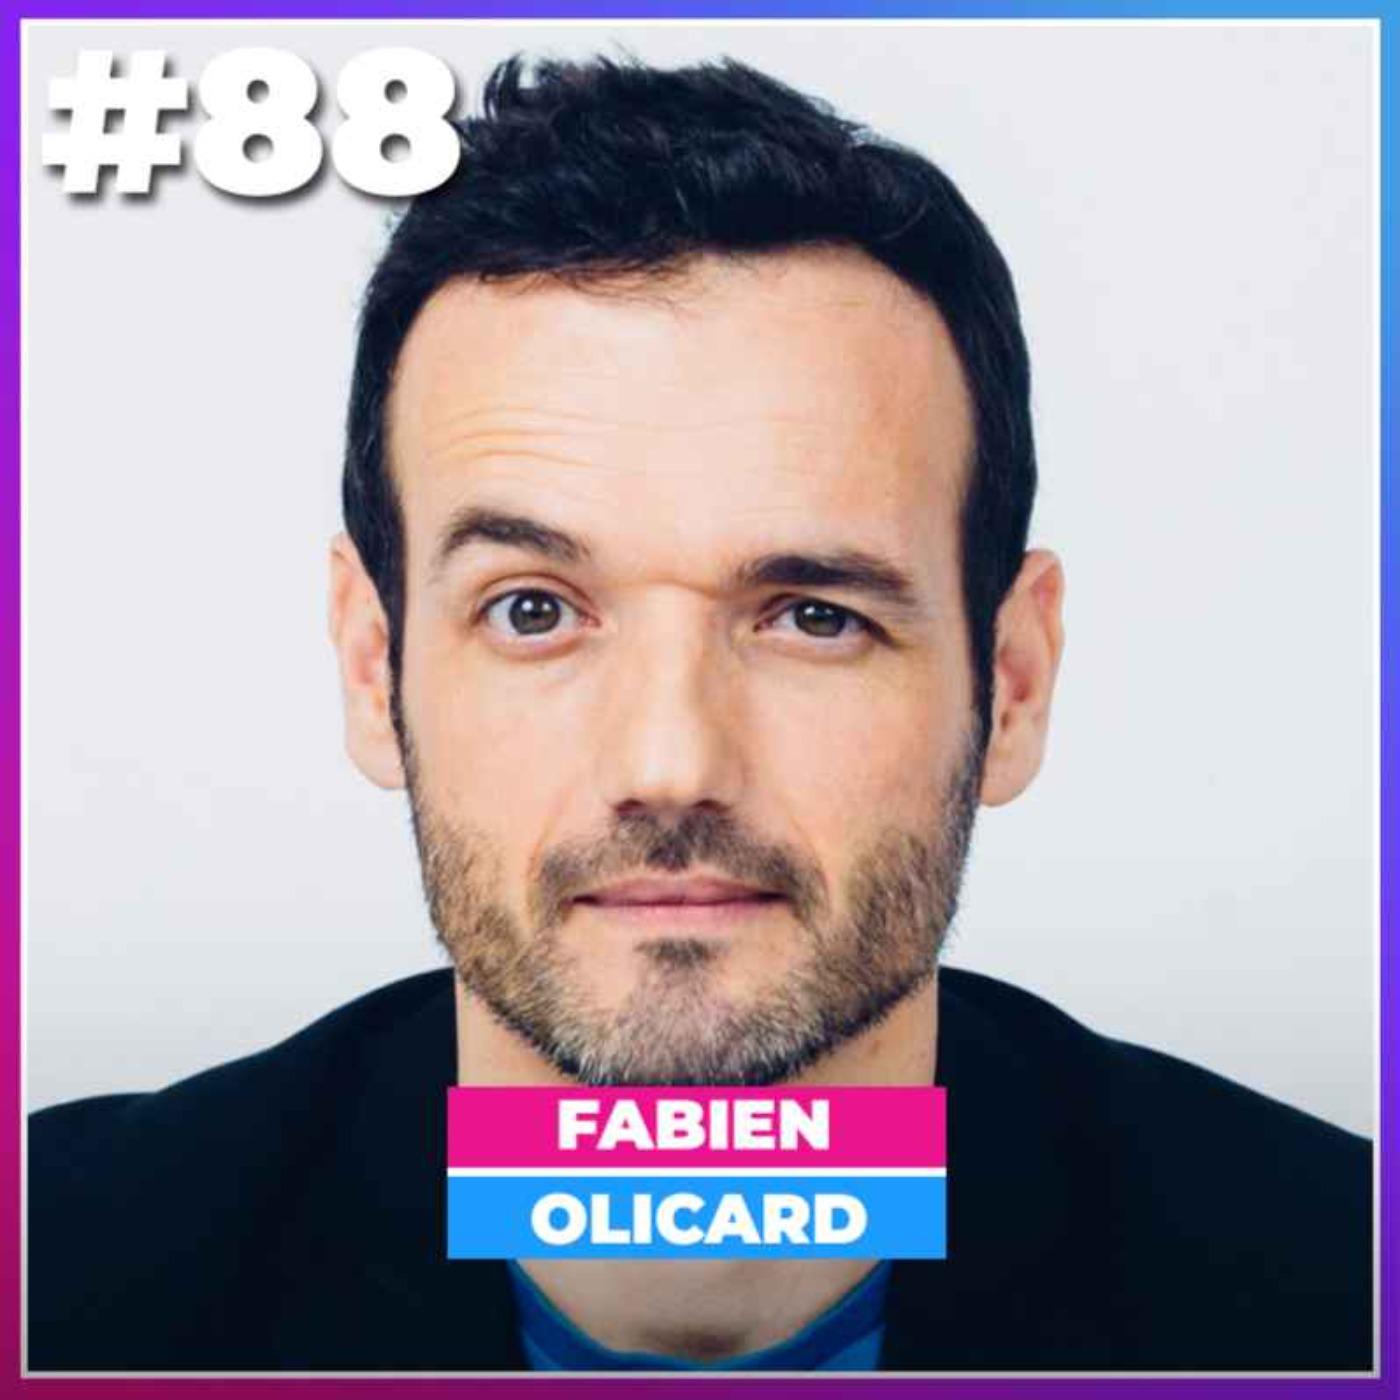 #88 FABIEN OLICARD: DE L'ARTISTE AU BUSINESSMAN